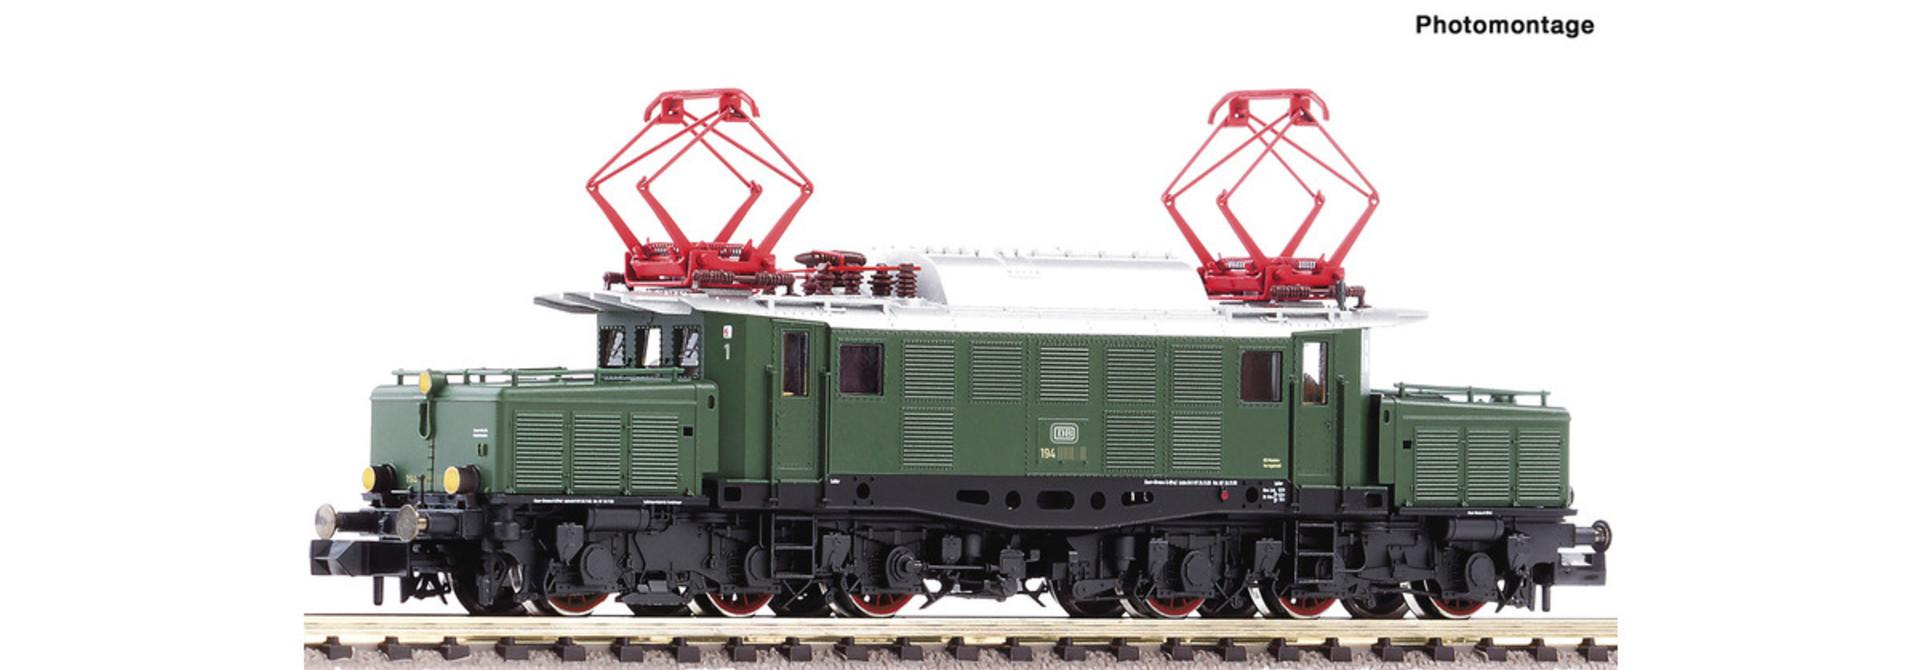 739419 E-Lok BR 194 der DB